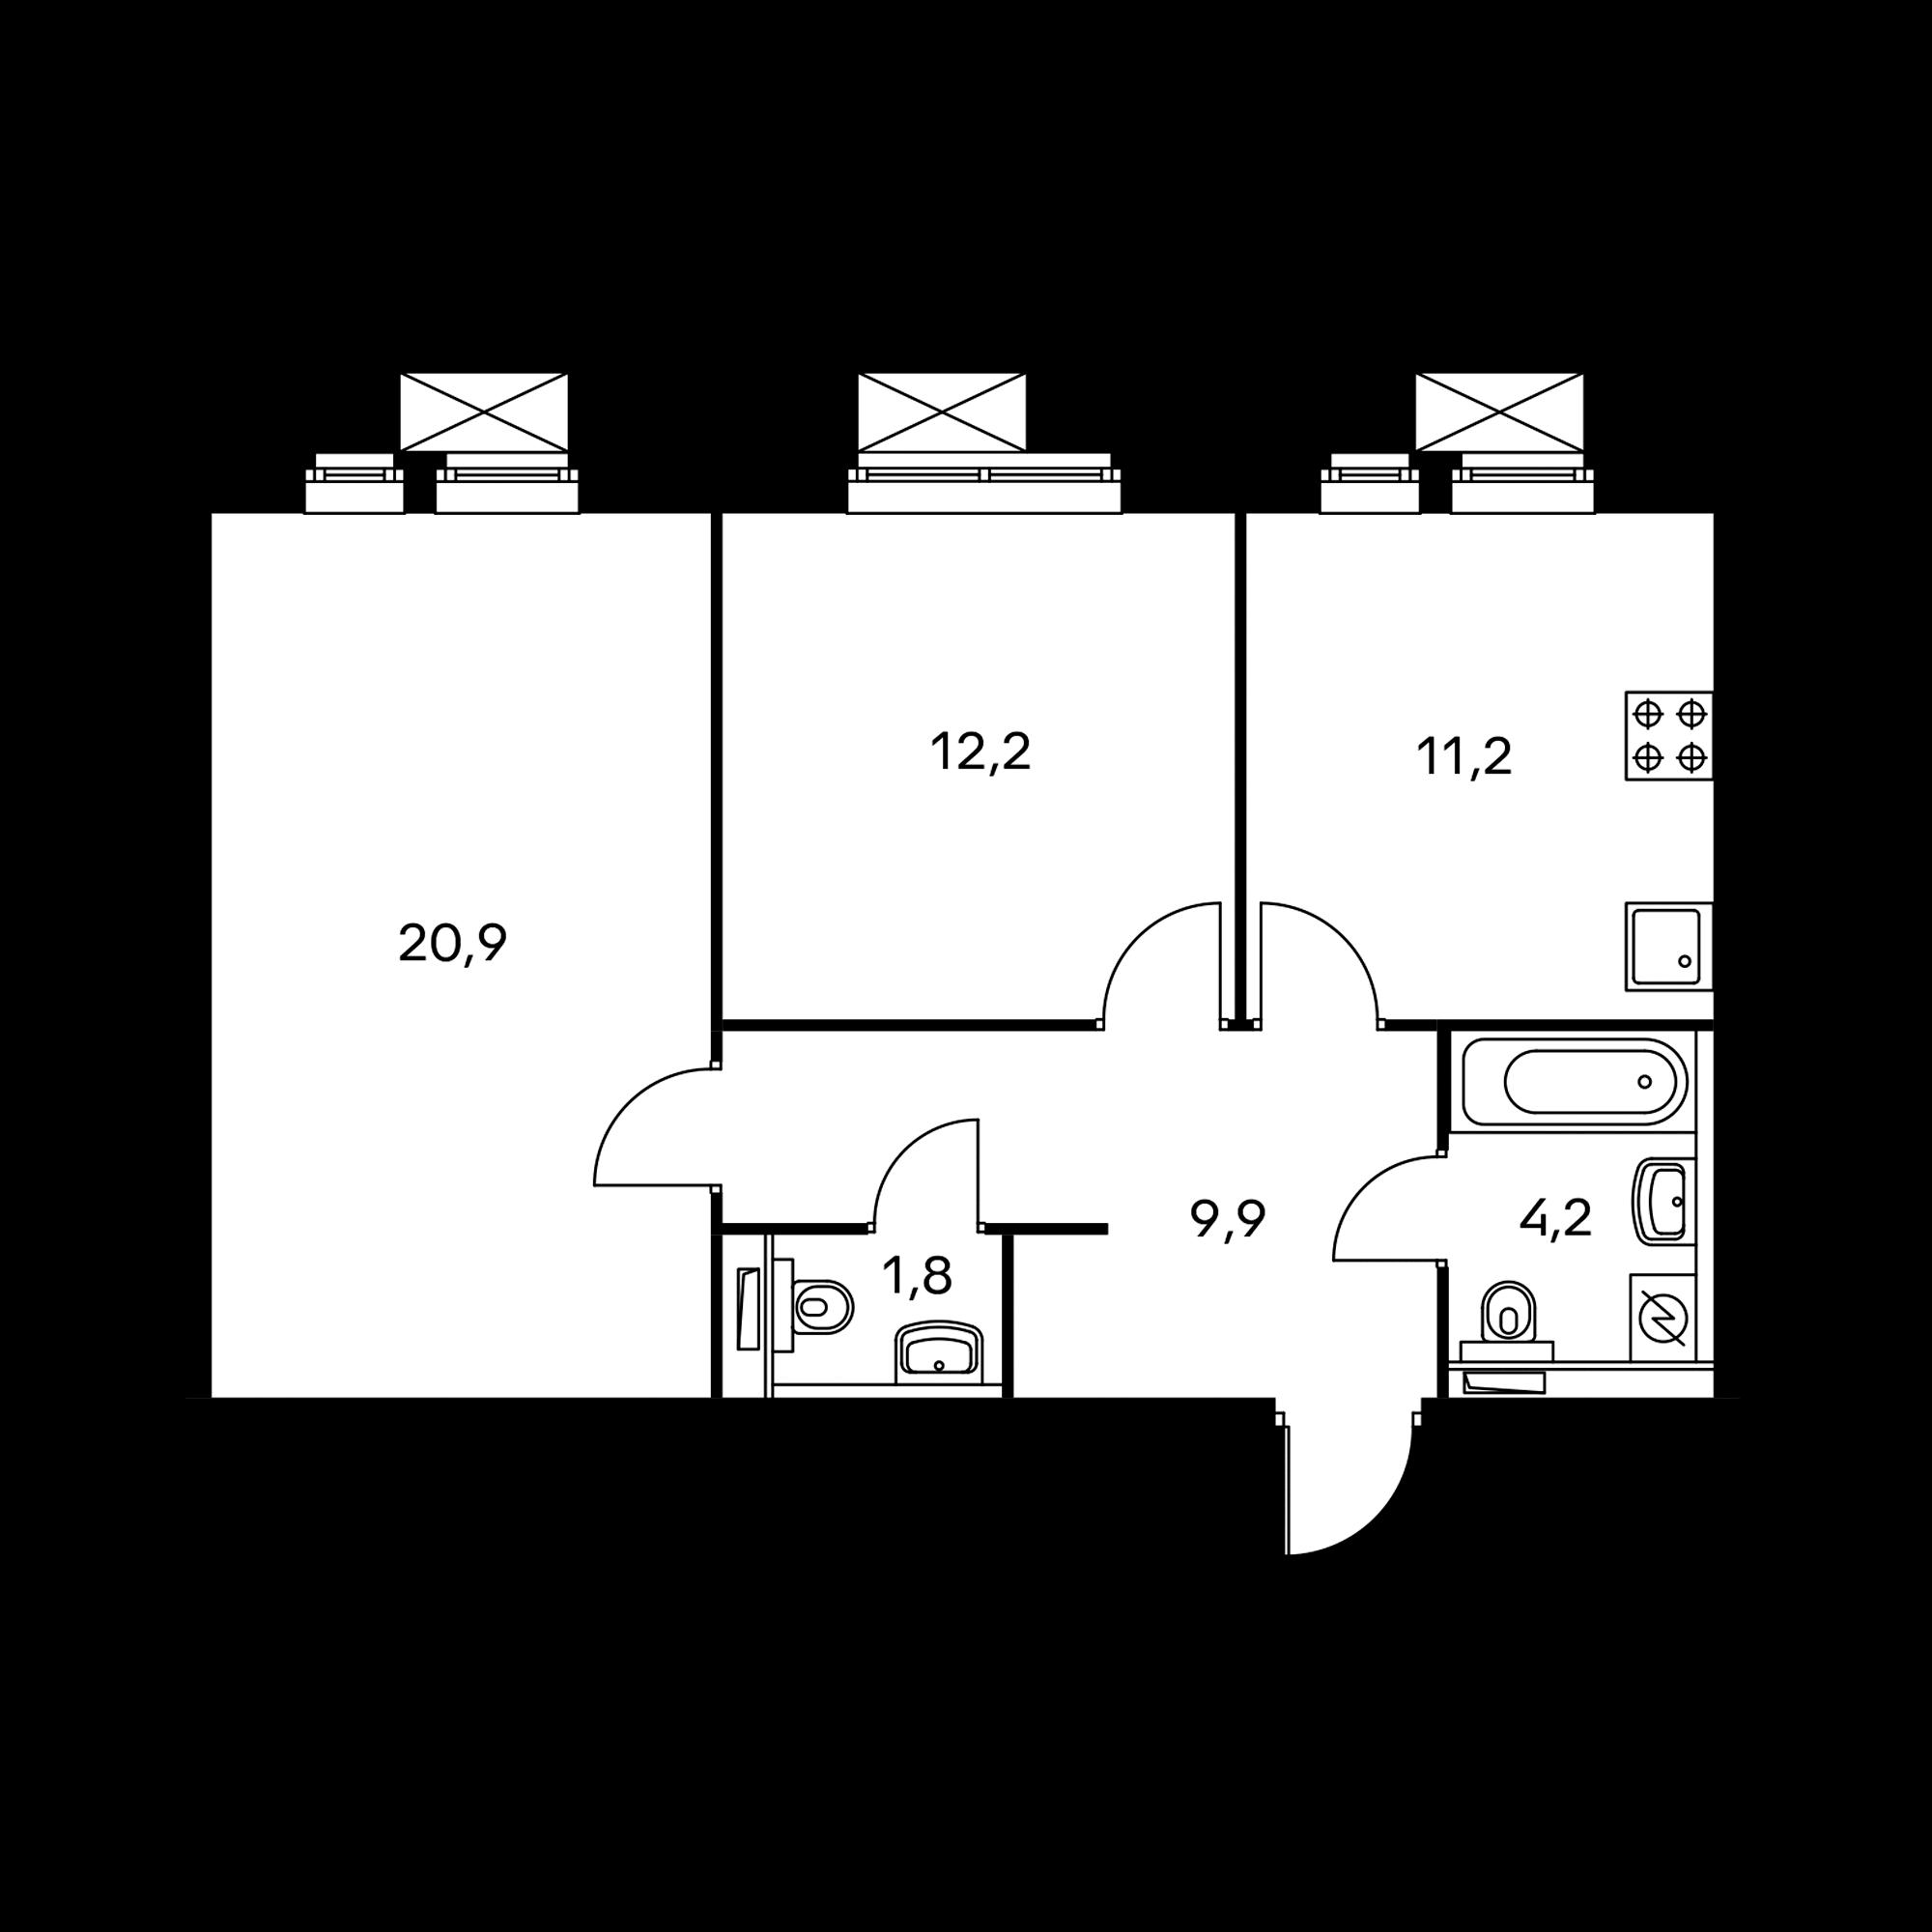 2KM6_10.5-1_S_Z